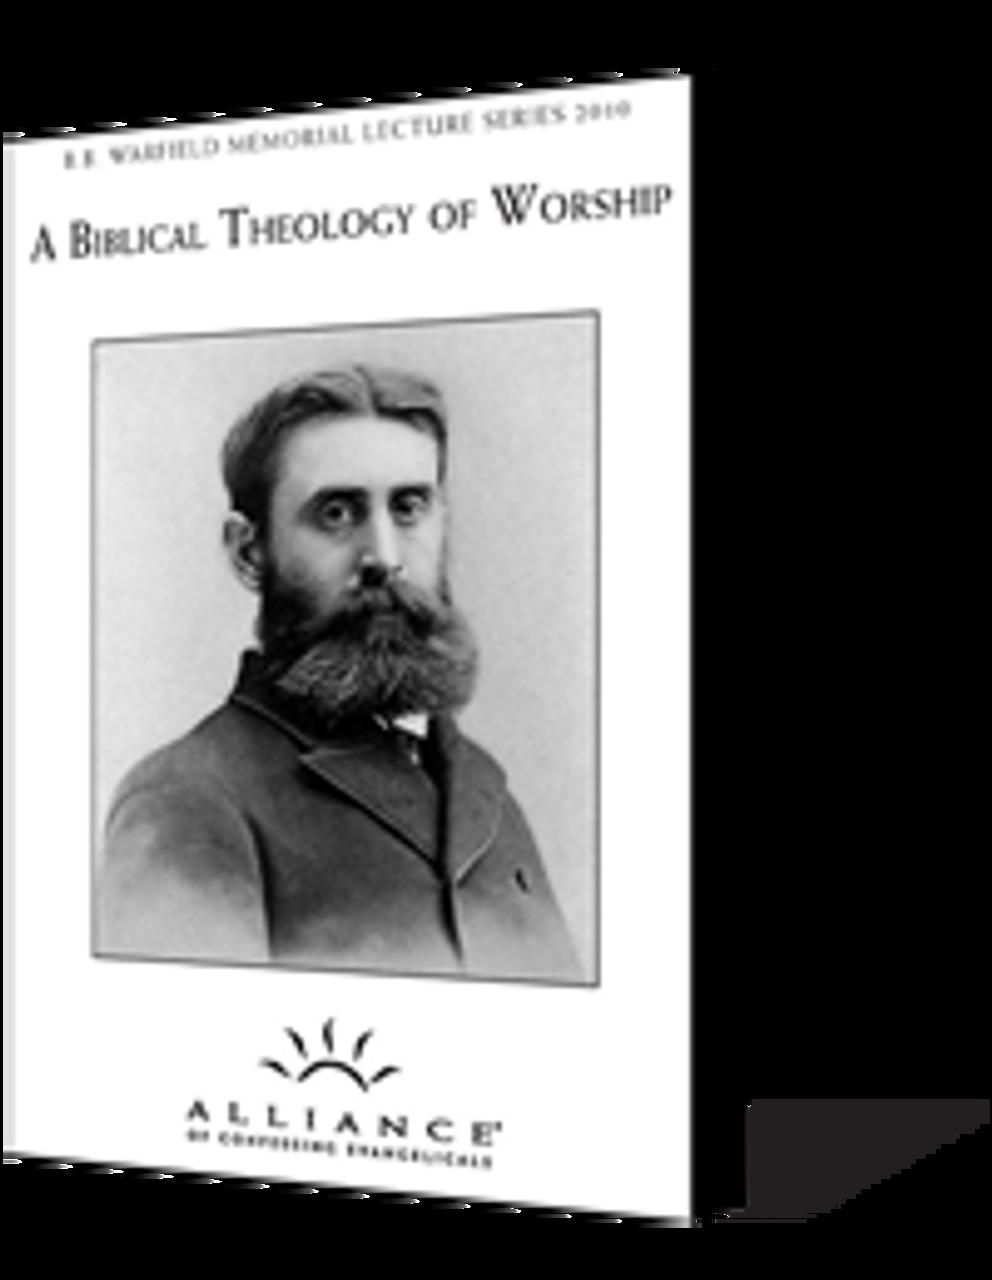 A Biblical Theology of Worship (CD Set)